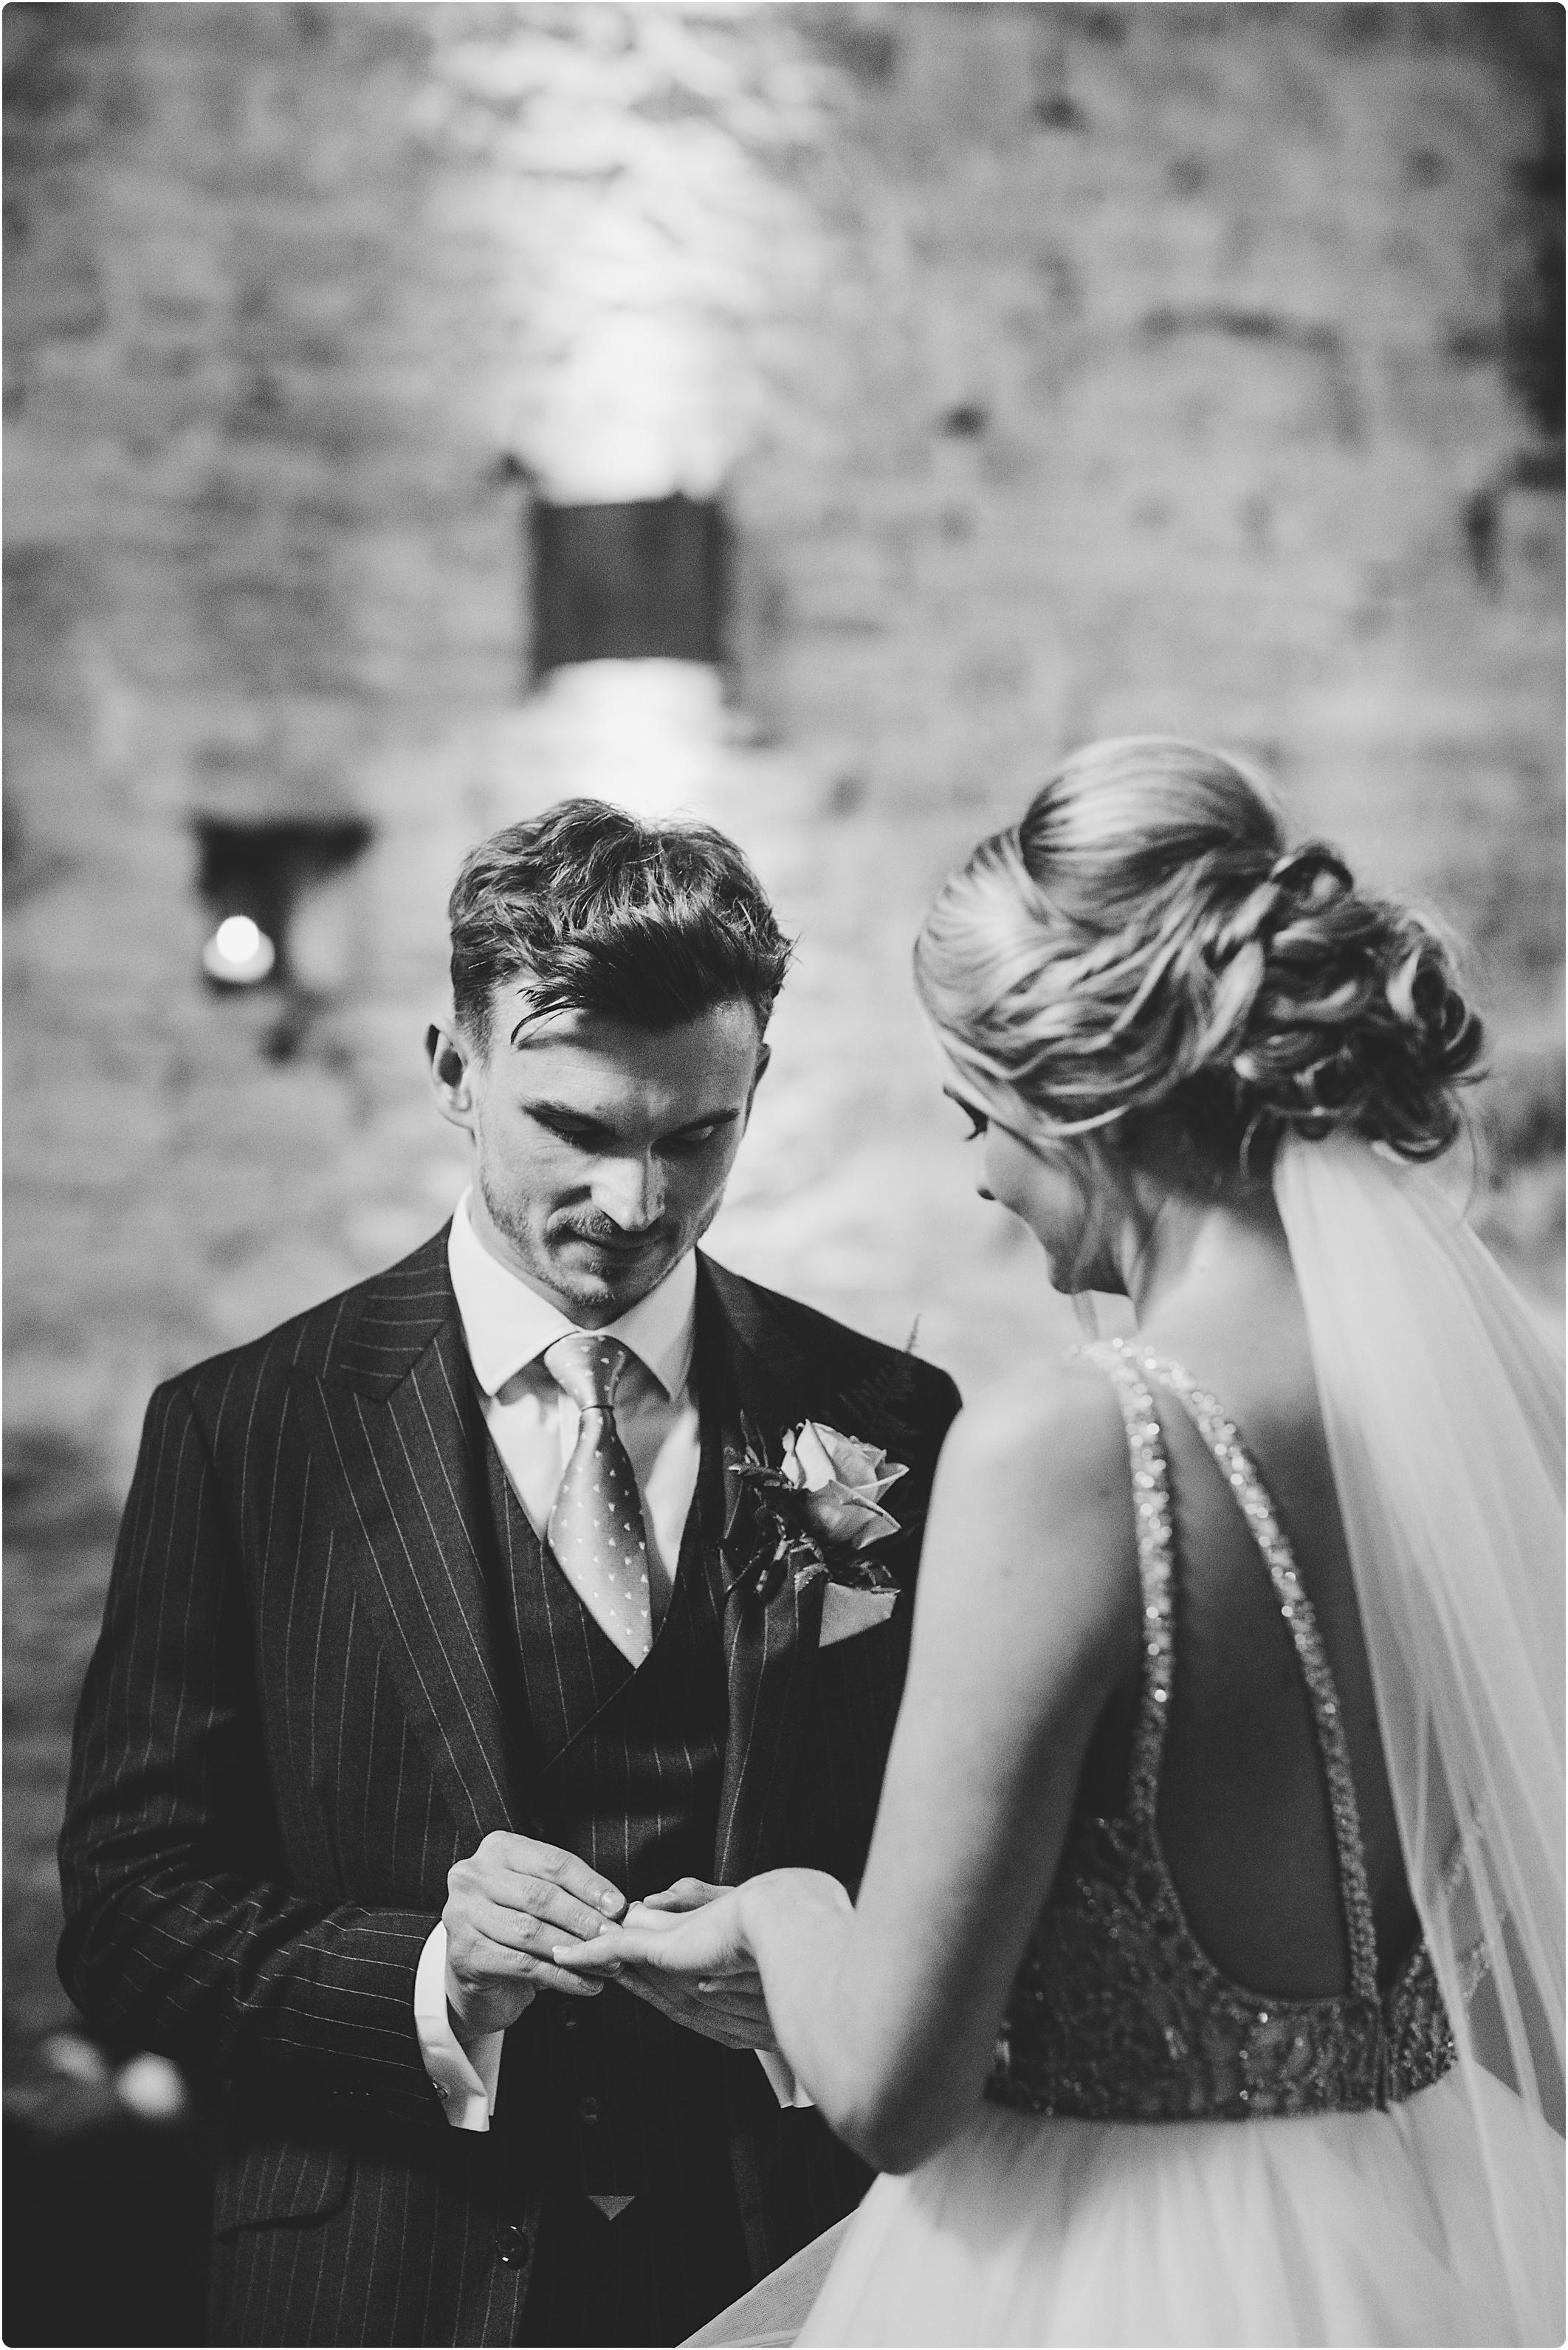 Cripps Barn groom putting ring on